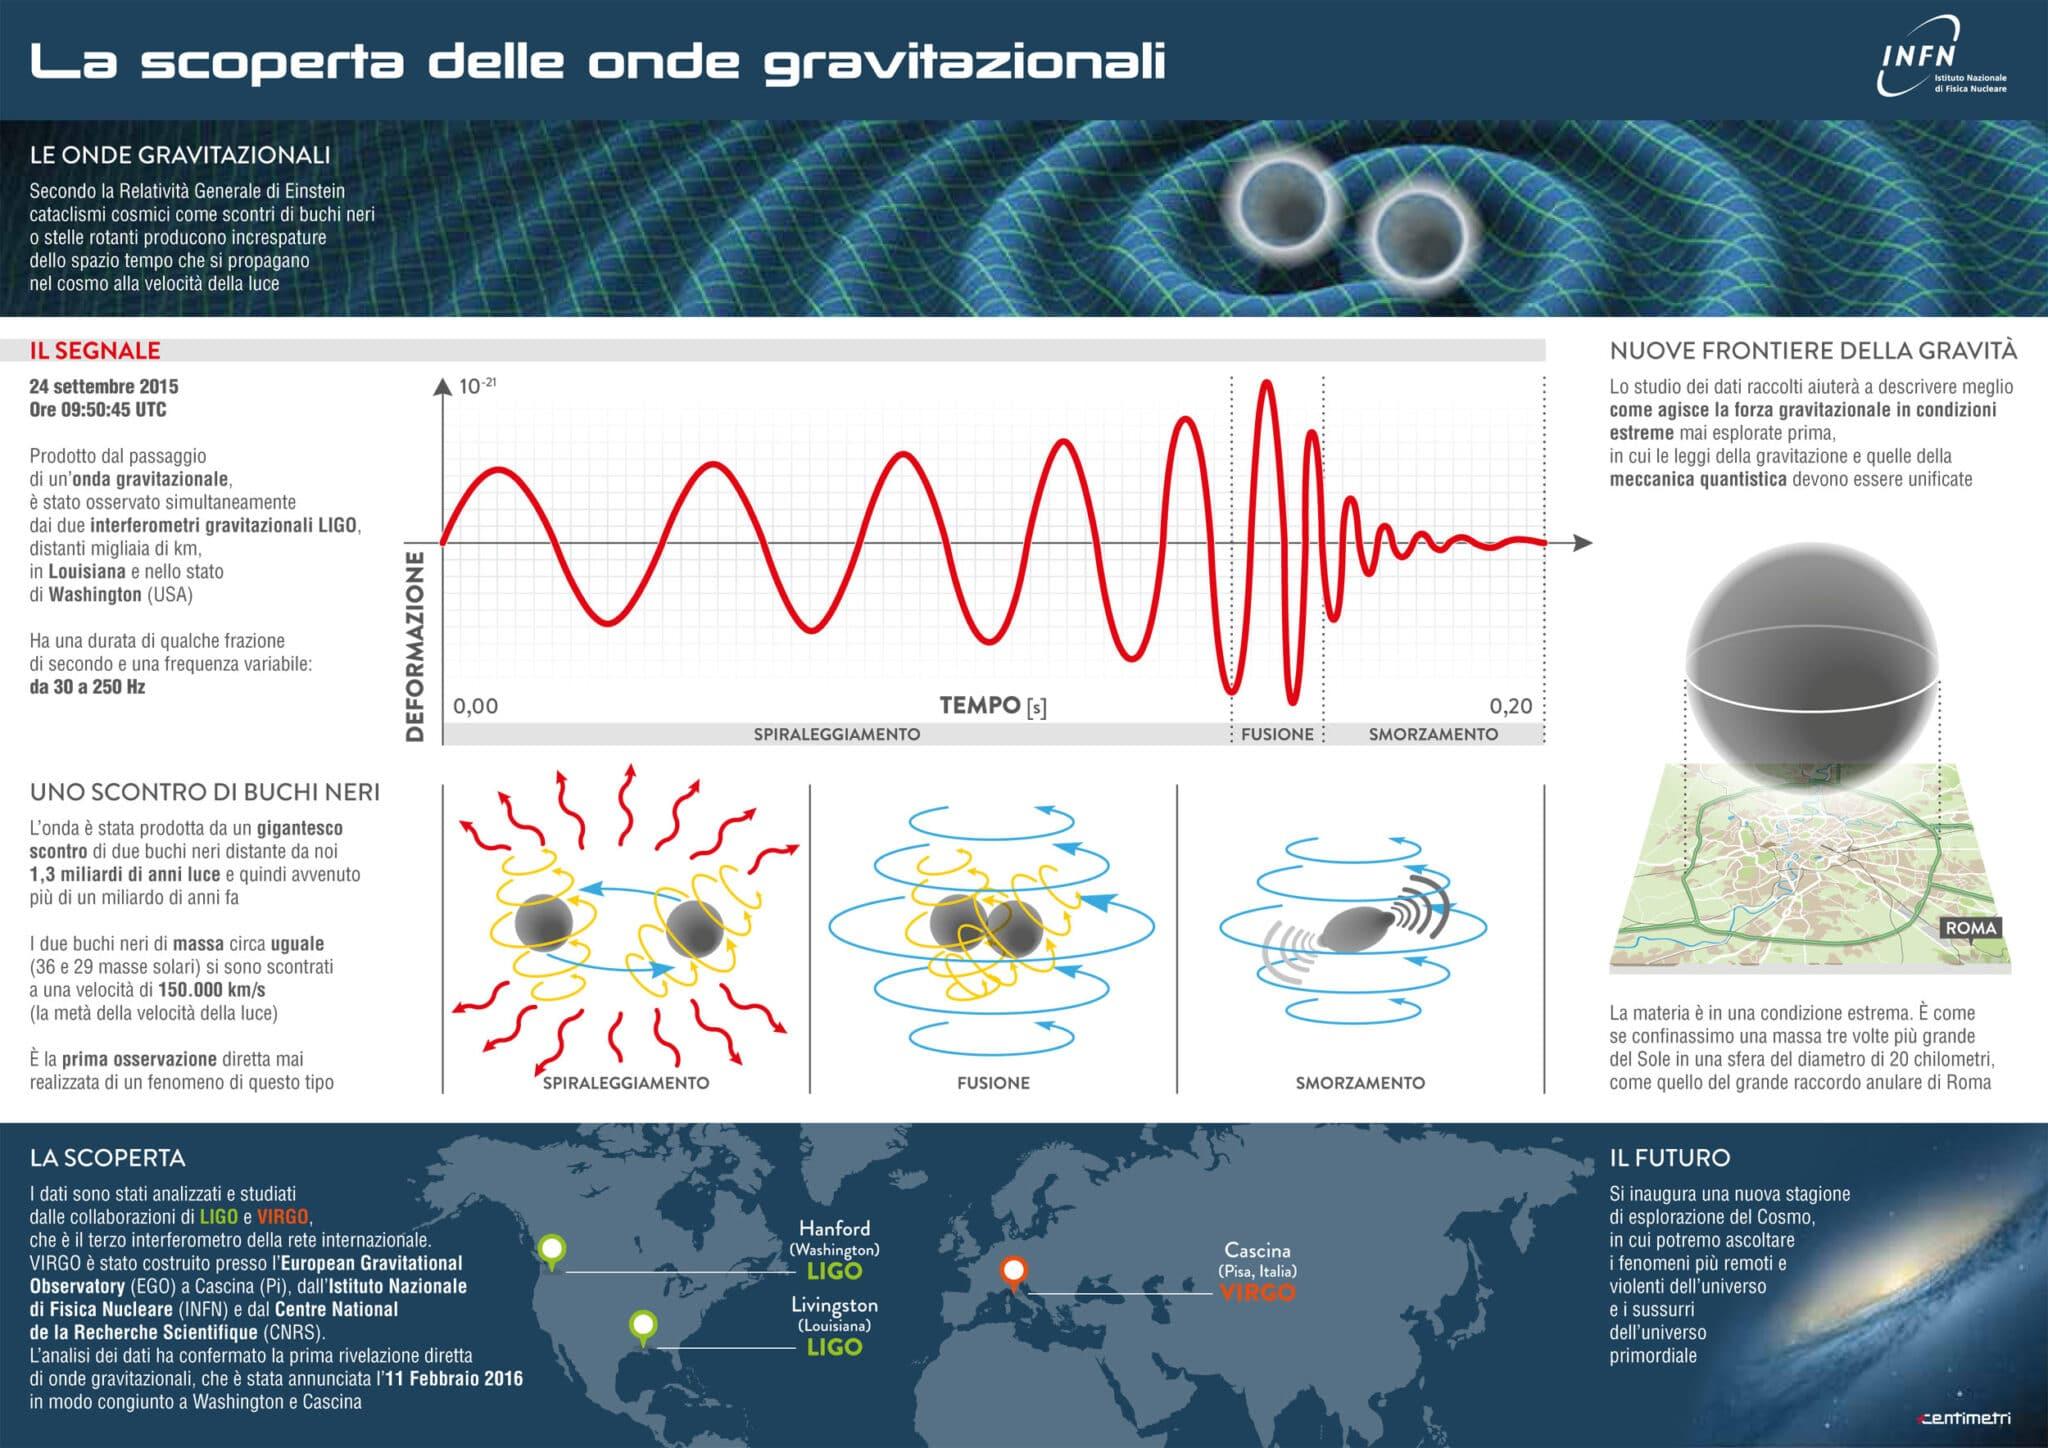 Onde gravitazionali - INFN